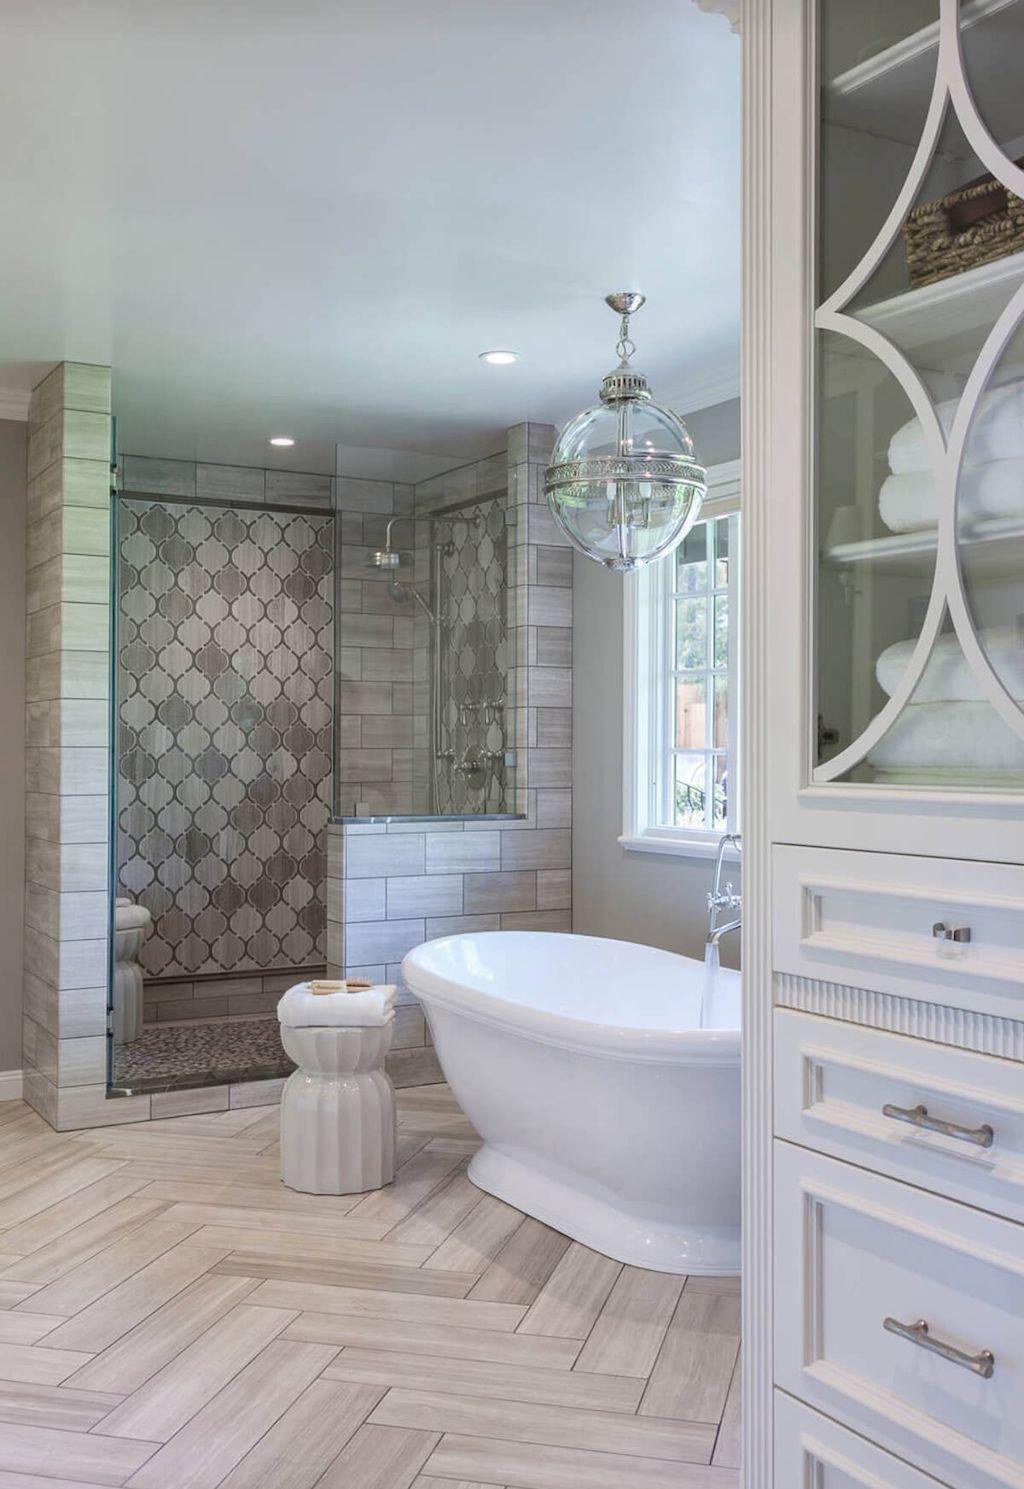 65 Master Bathroom Bathtub Remodel Ideas | Pinterest | Master ...